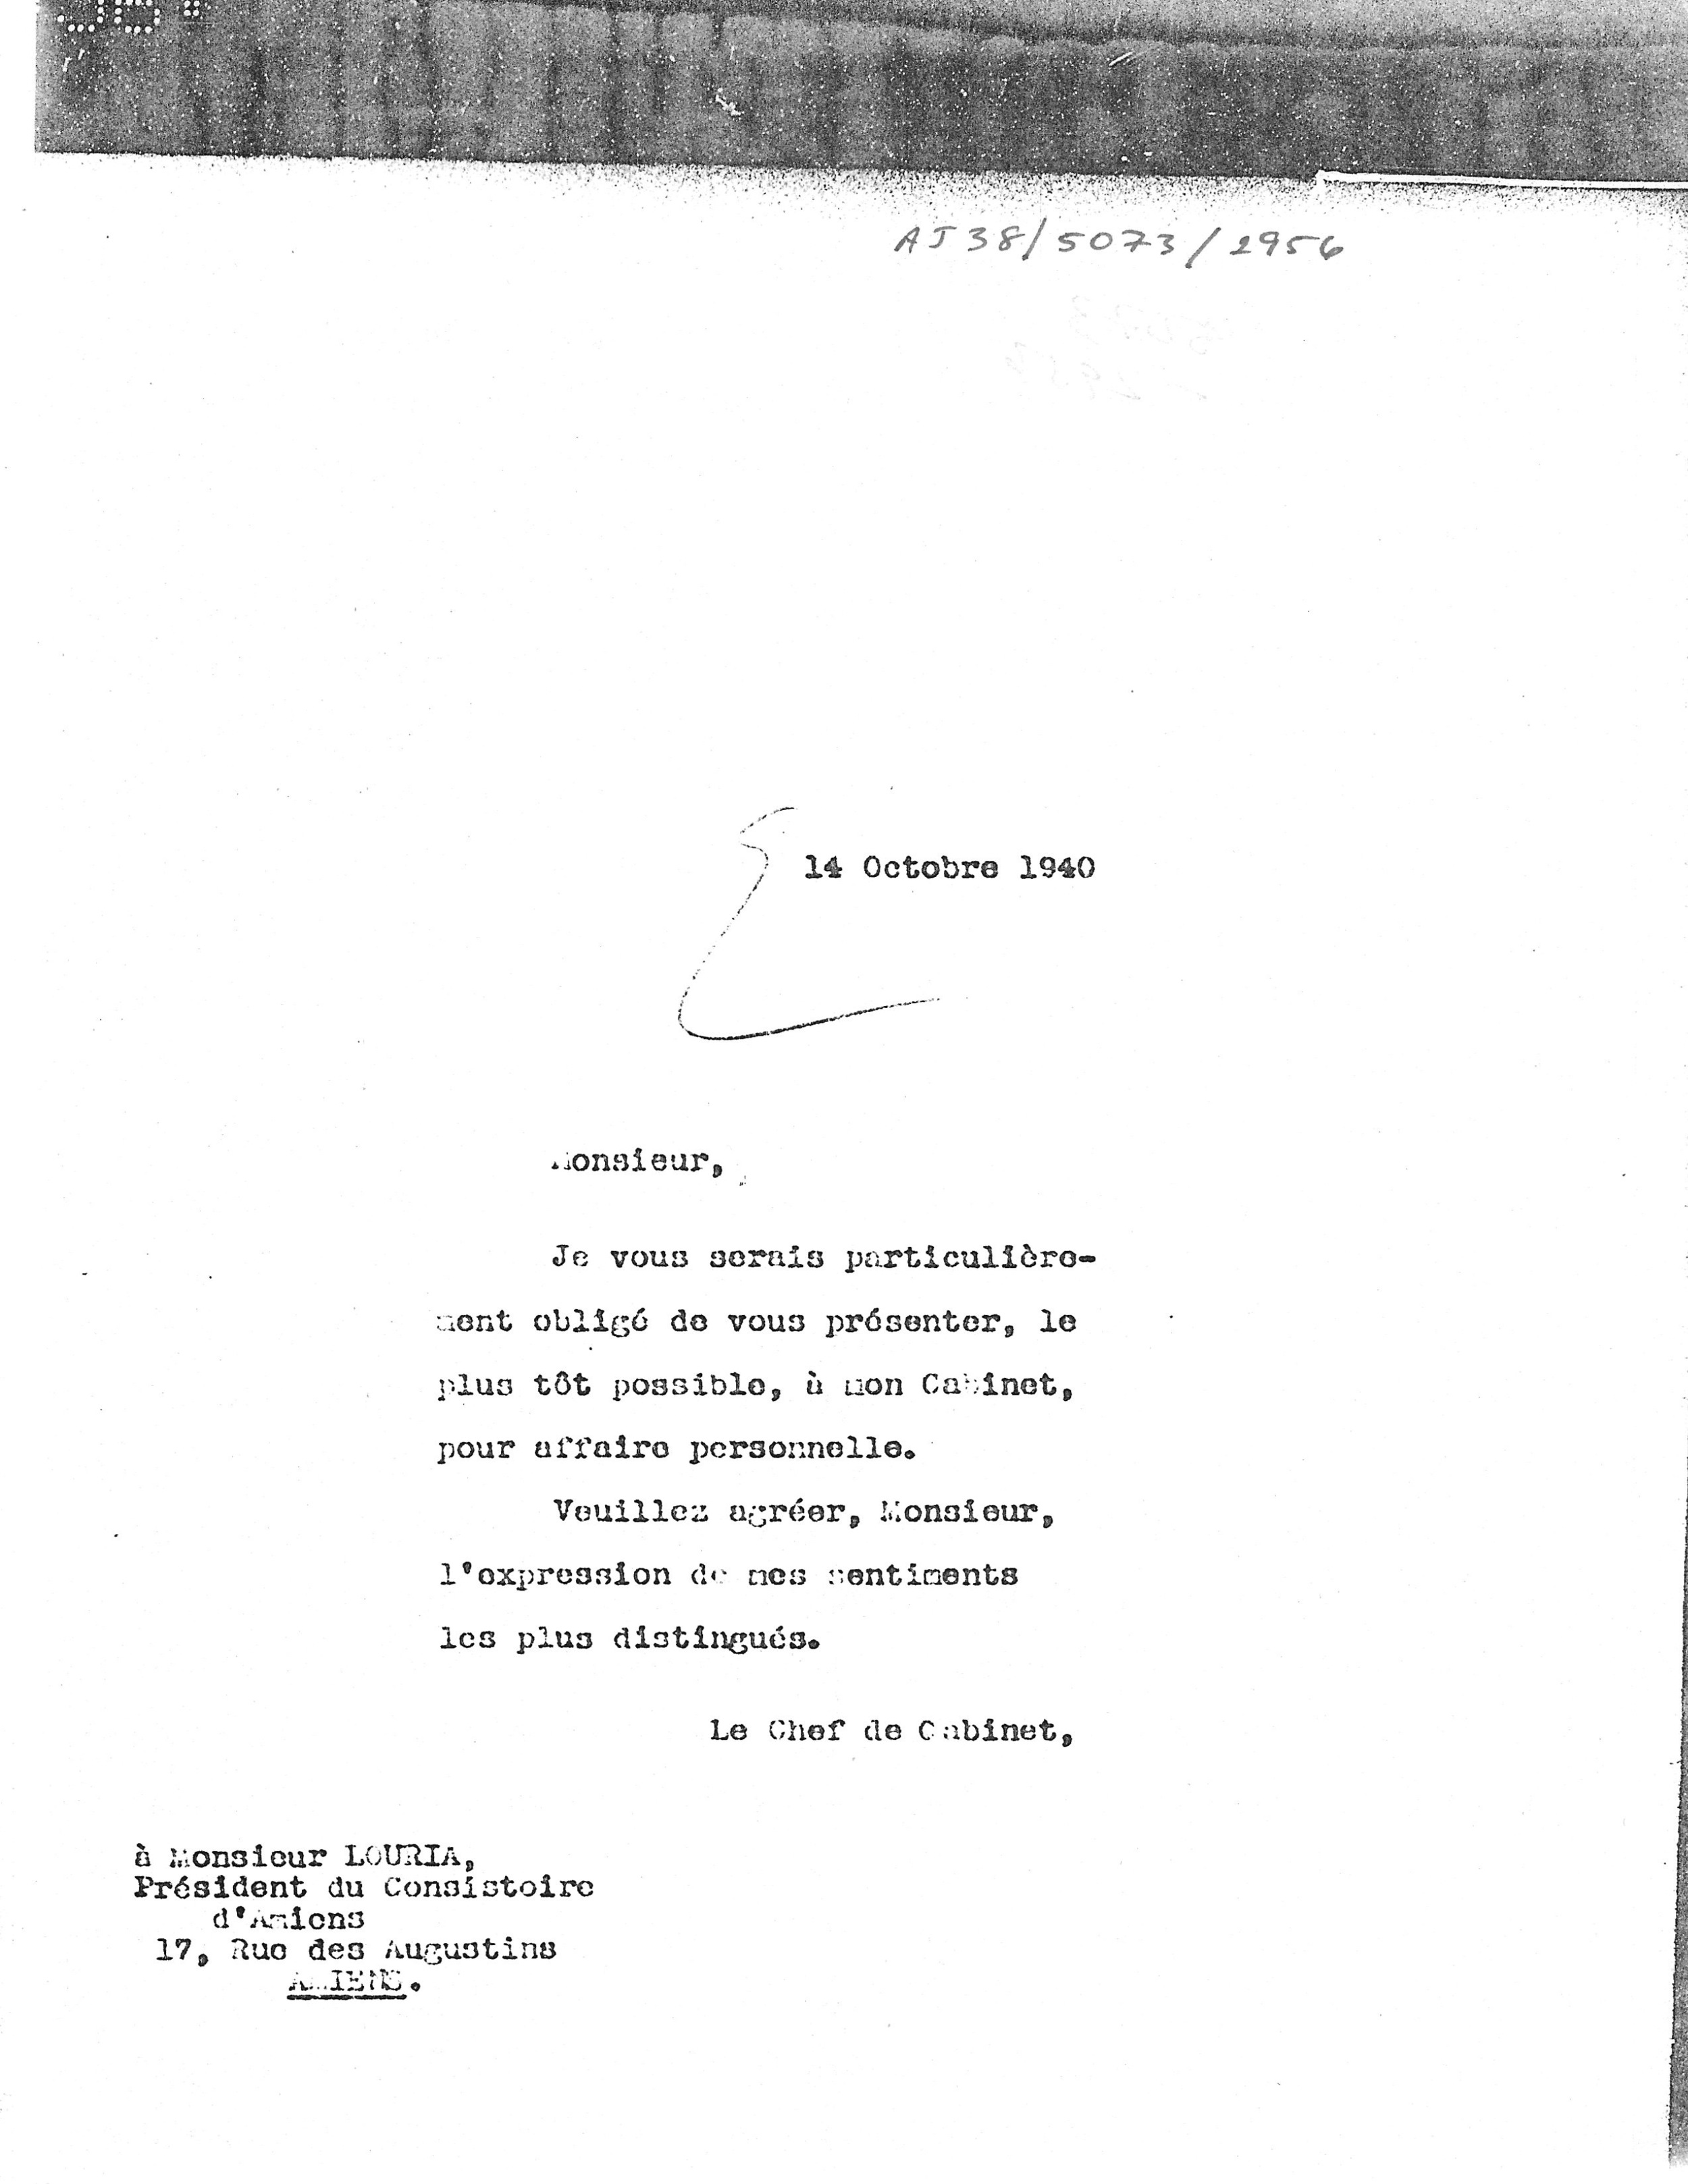 AJ38 5073 1956